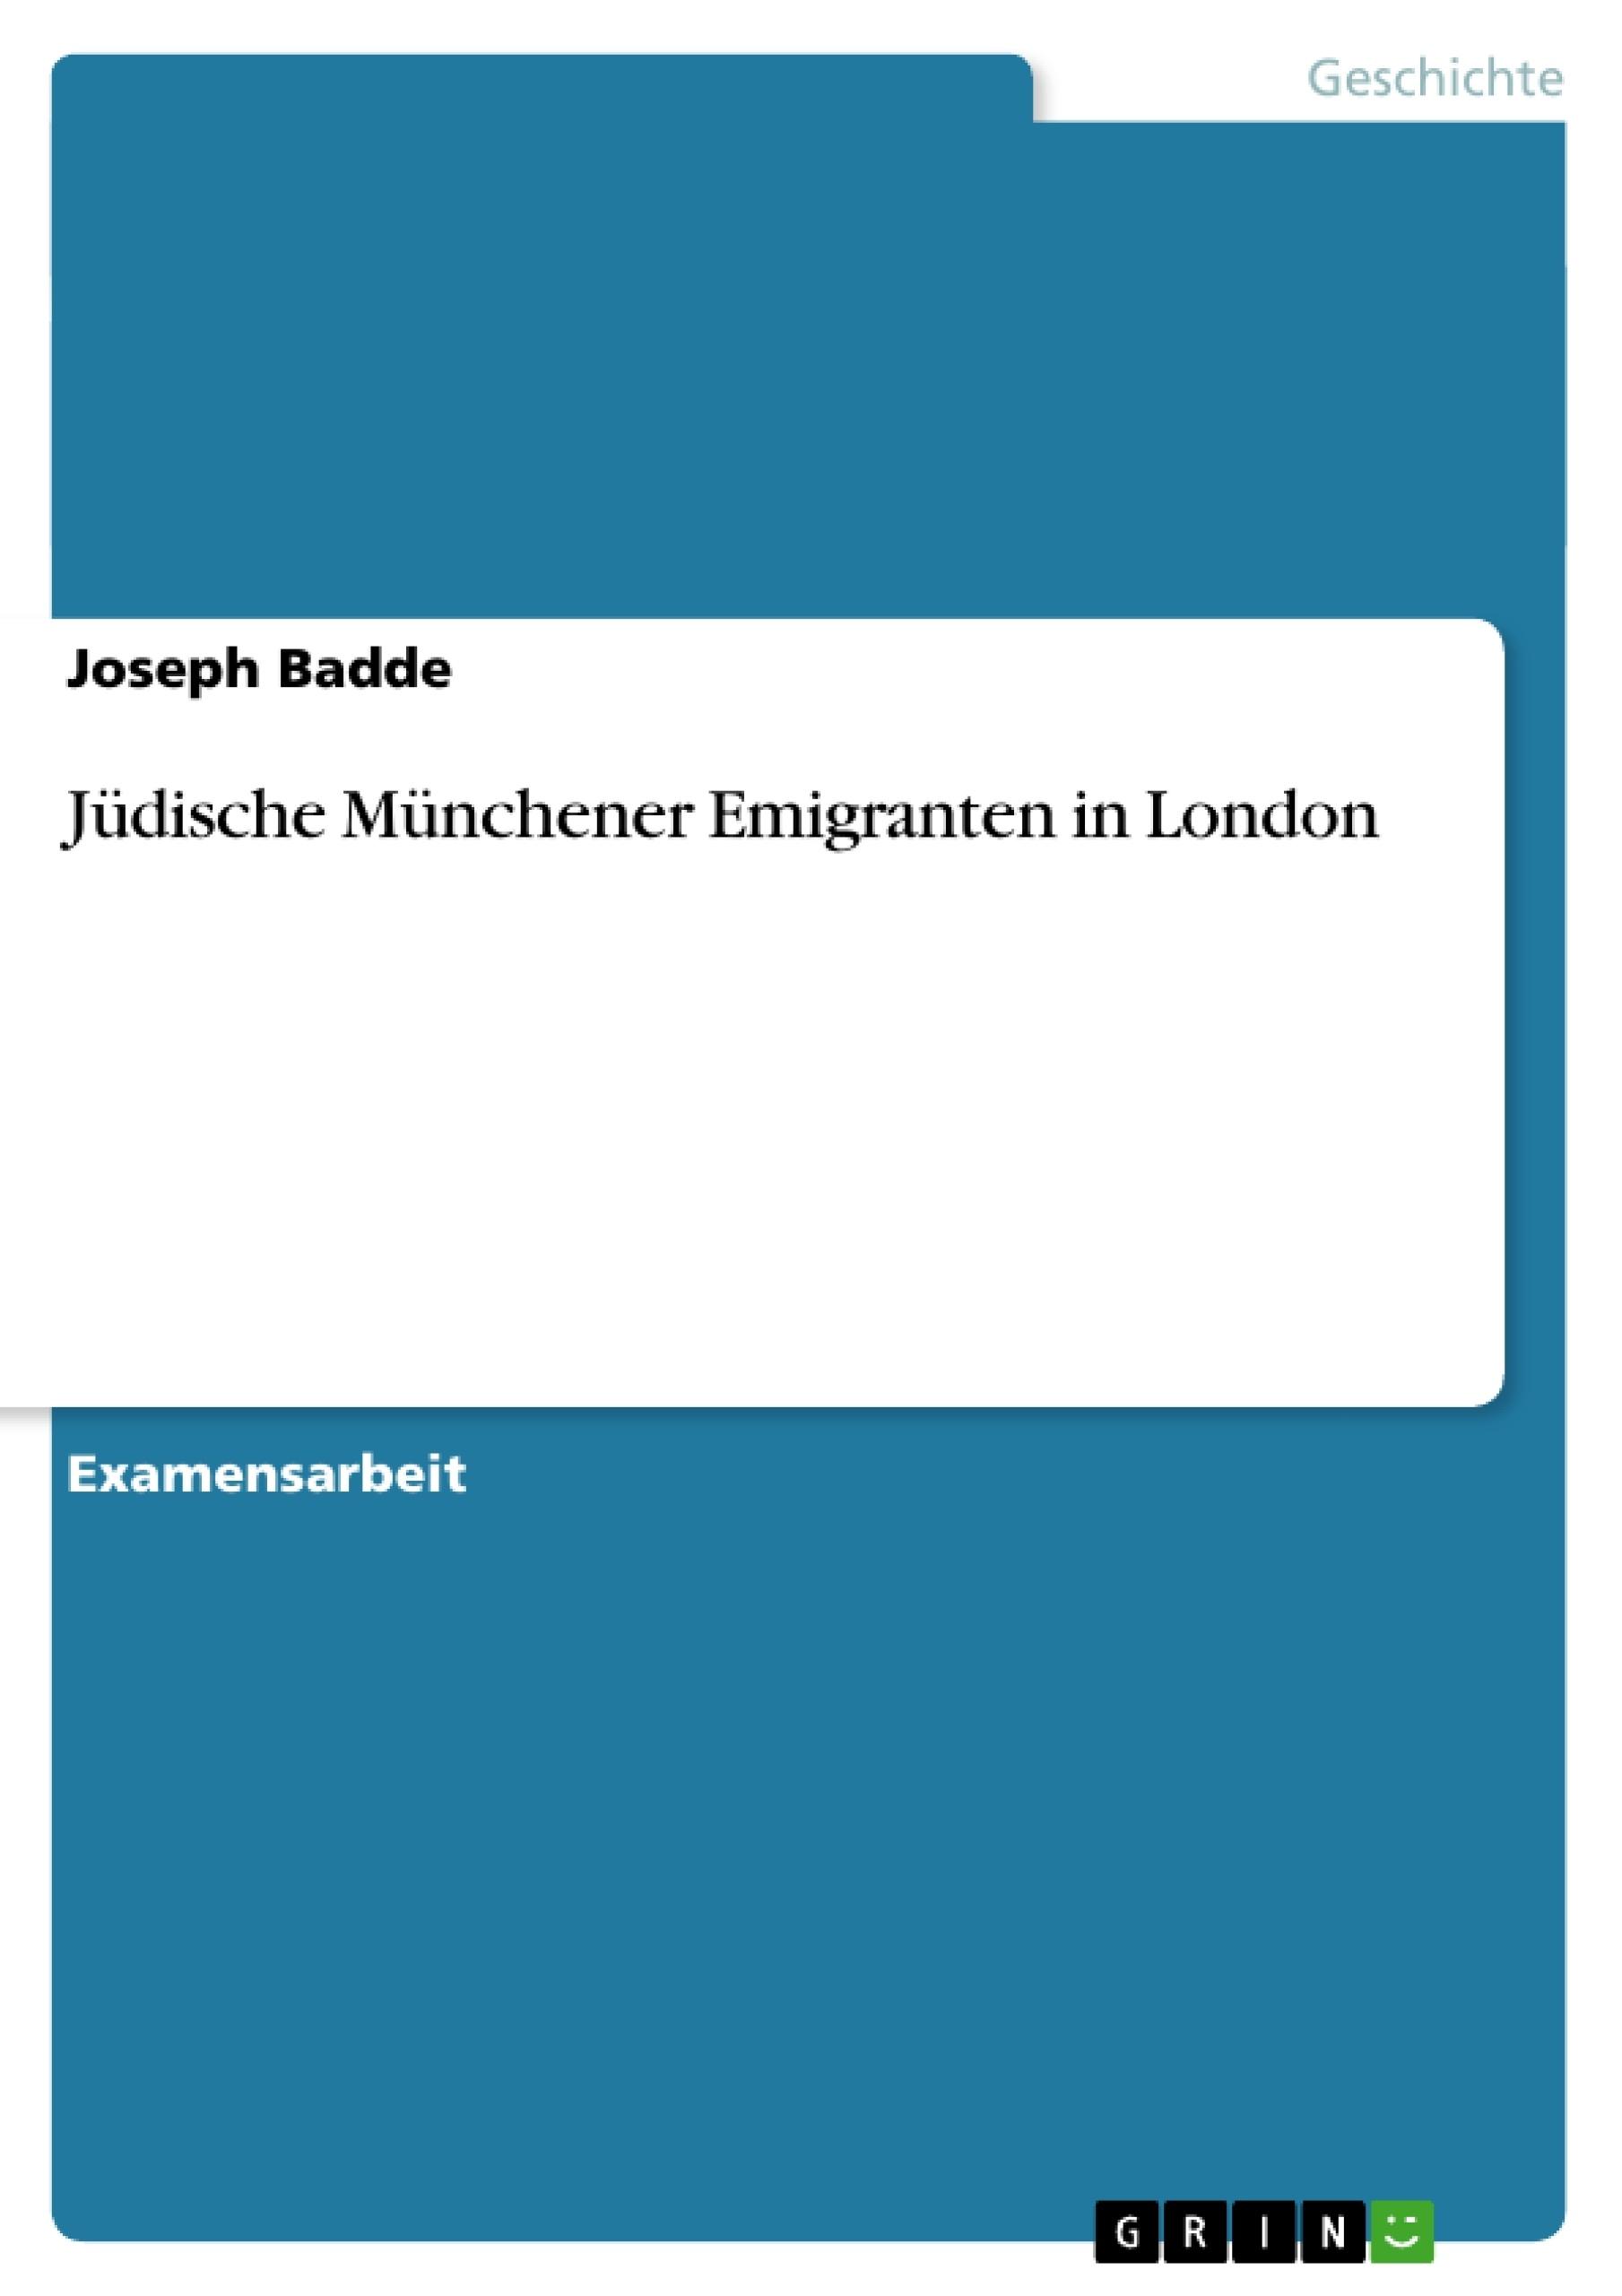 Titel: Jüdische Münchener Emigranten in London